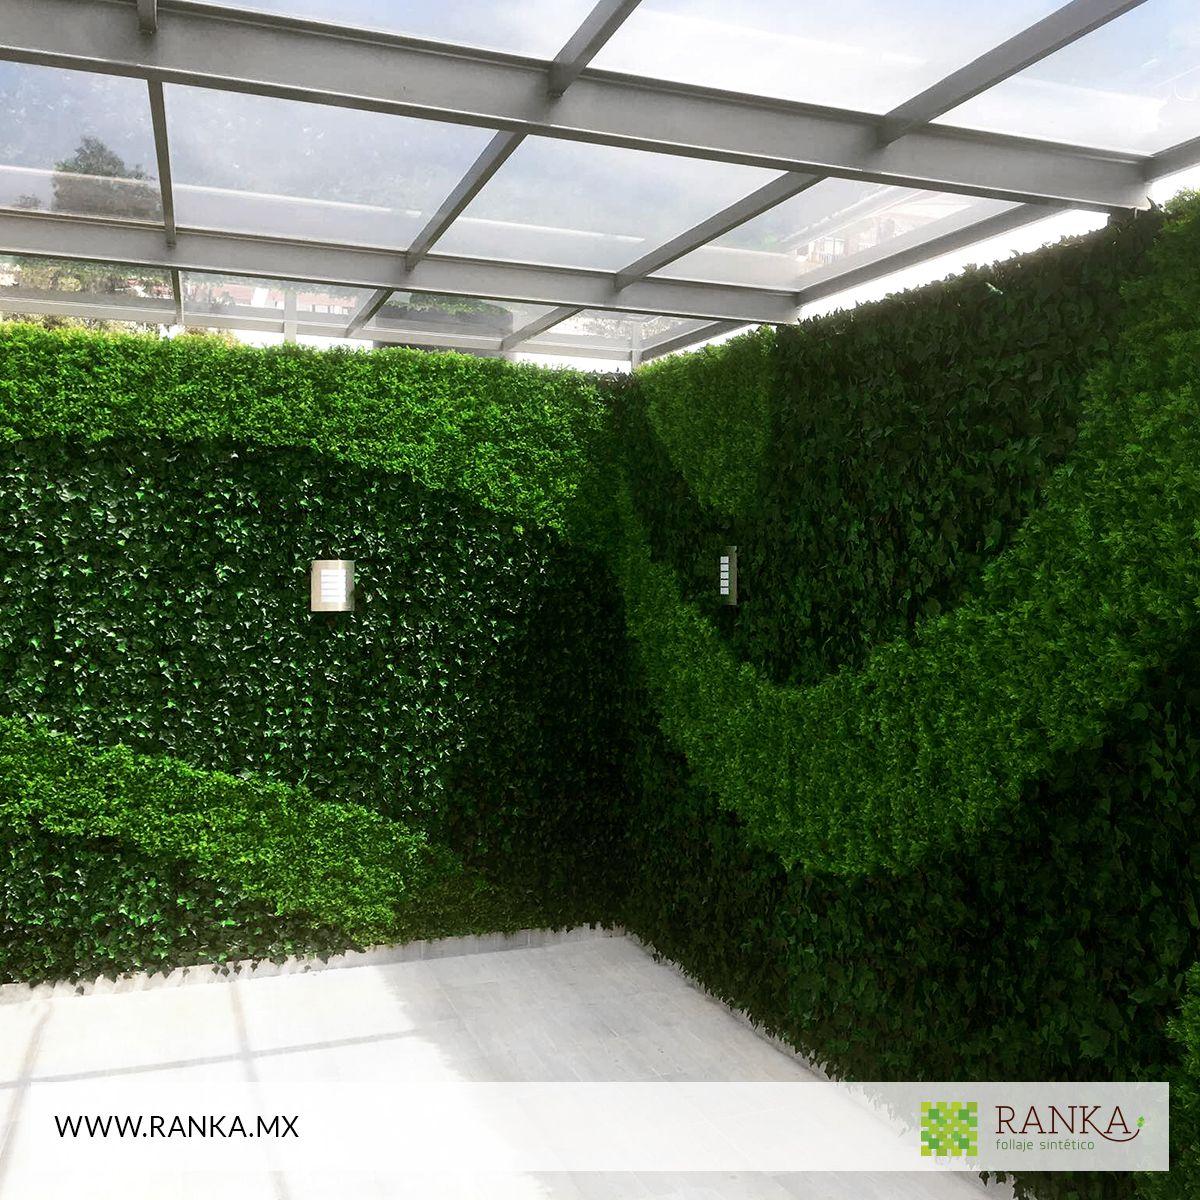 Follaje artificial para crear espacios envidiables Plantas para muros verdes verticales